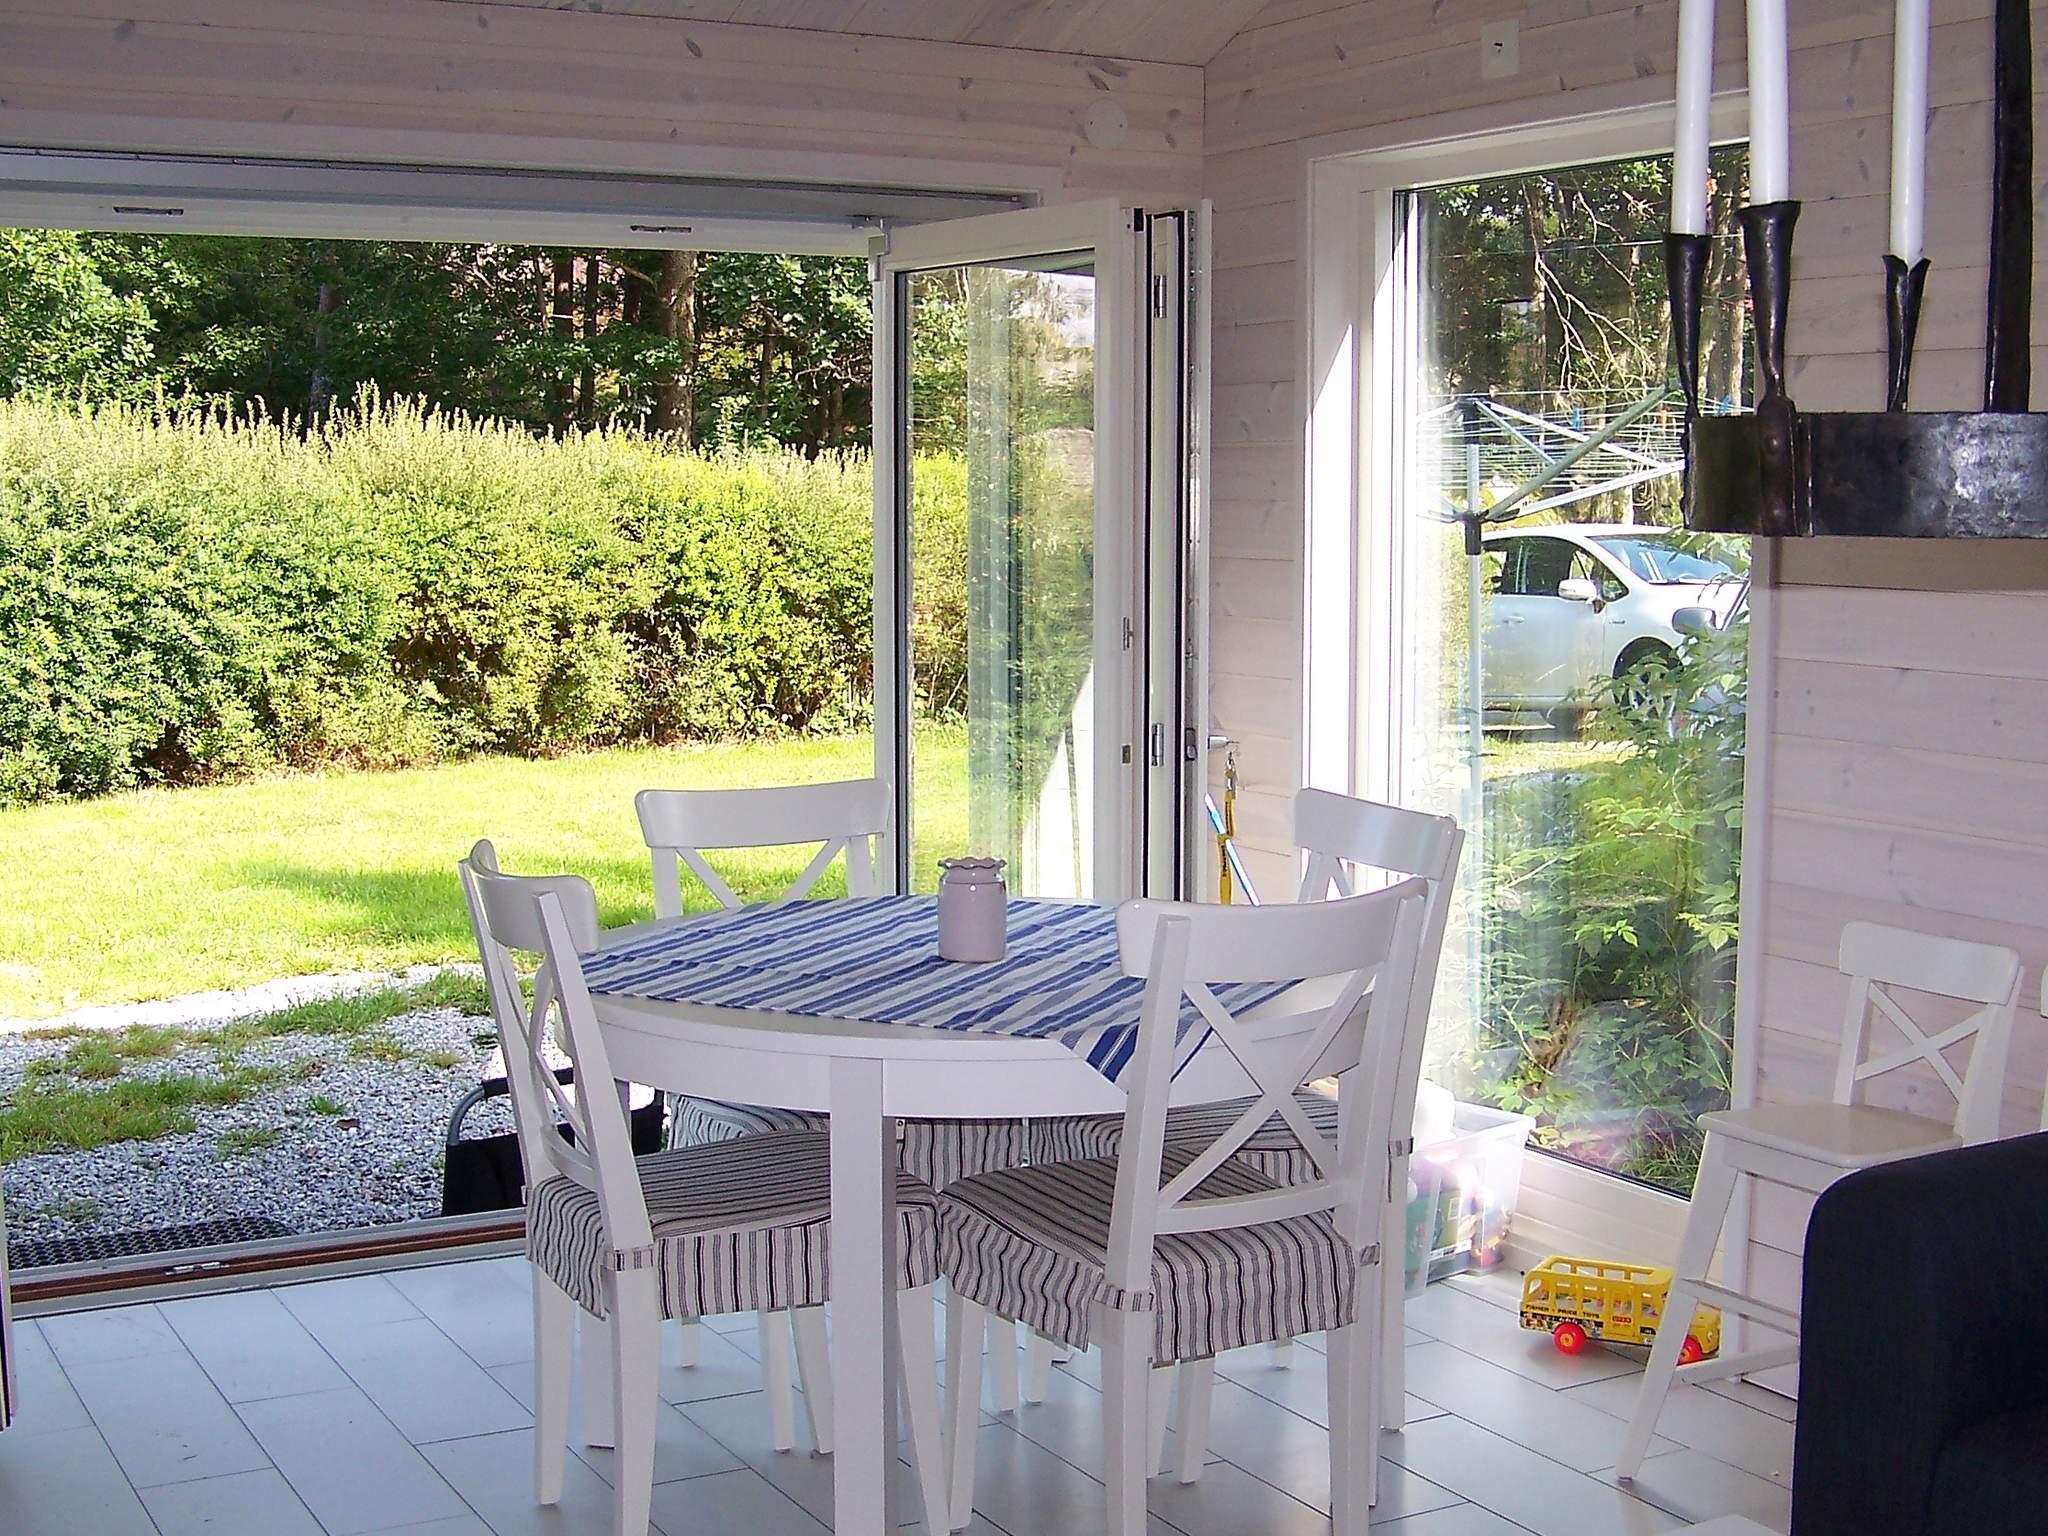 Ferienhaus Tjörn/Huseberg (672440), Kållekärr, Tjörn, Westschweden, Schweden, Bild 3